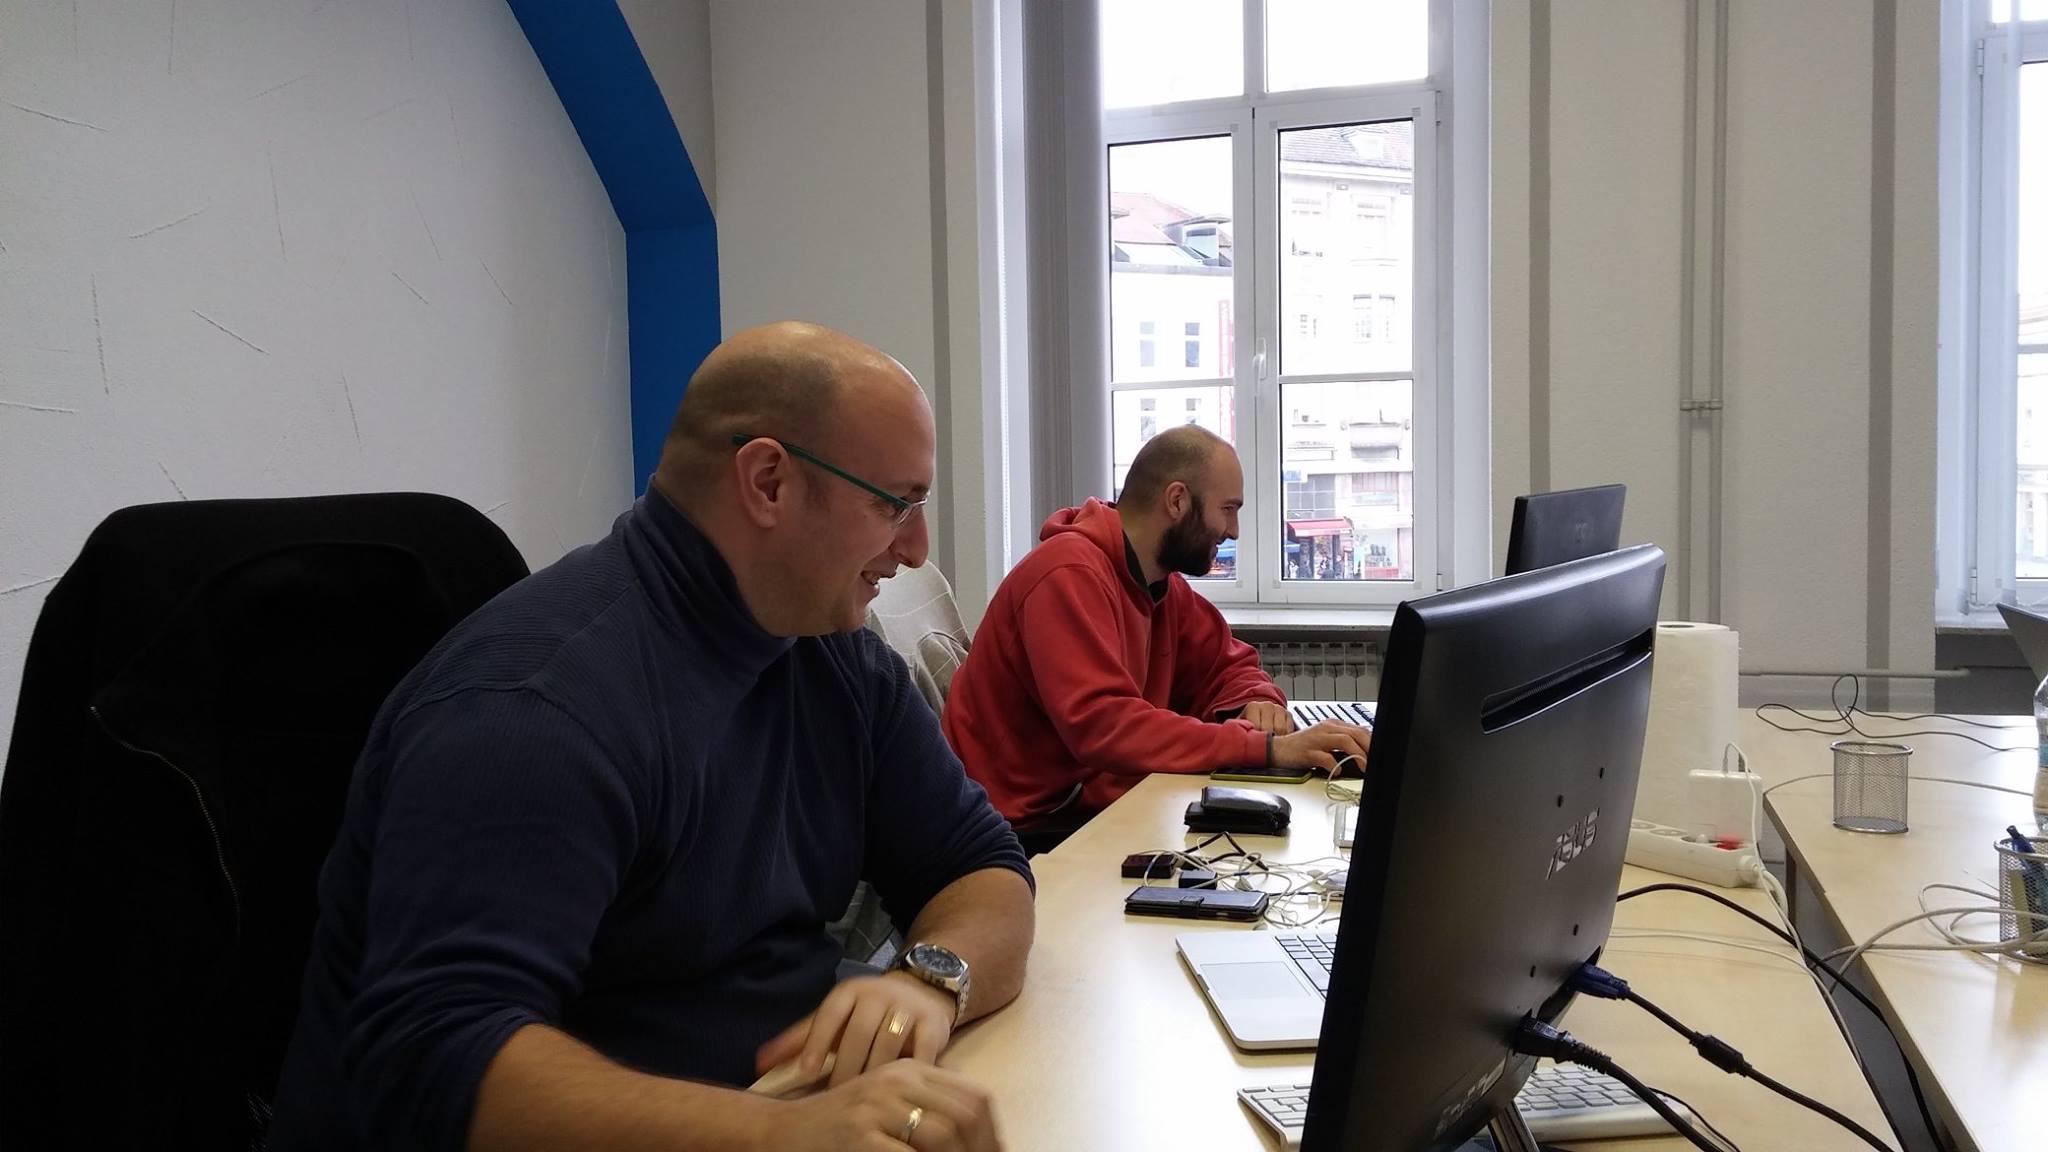 Working in the new office in Osijek